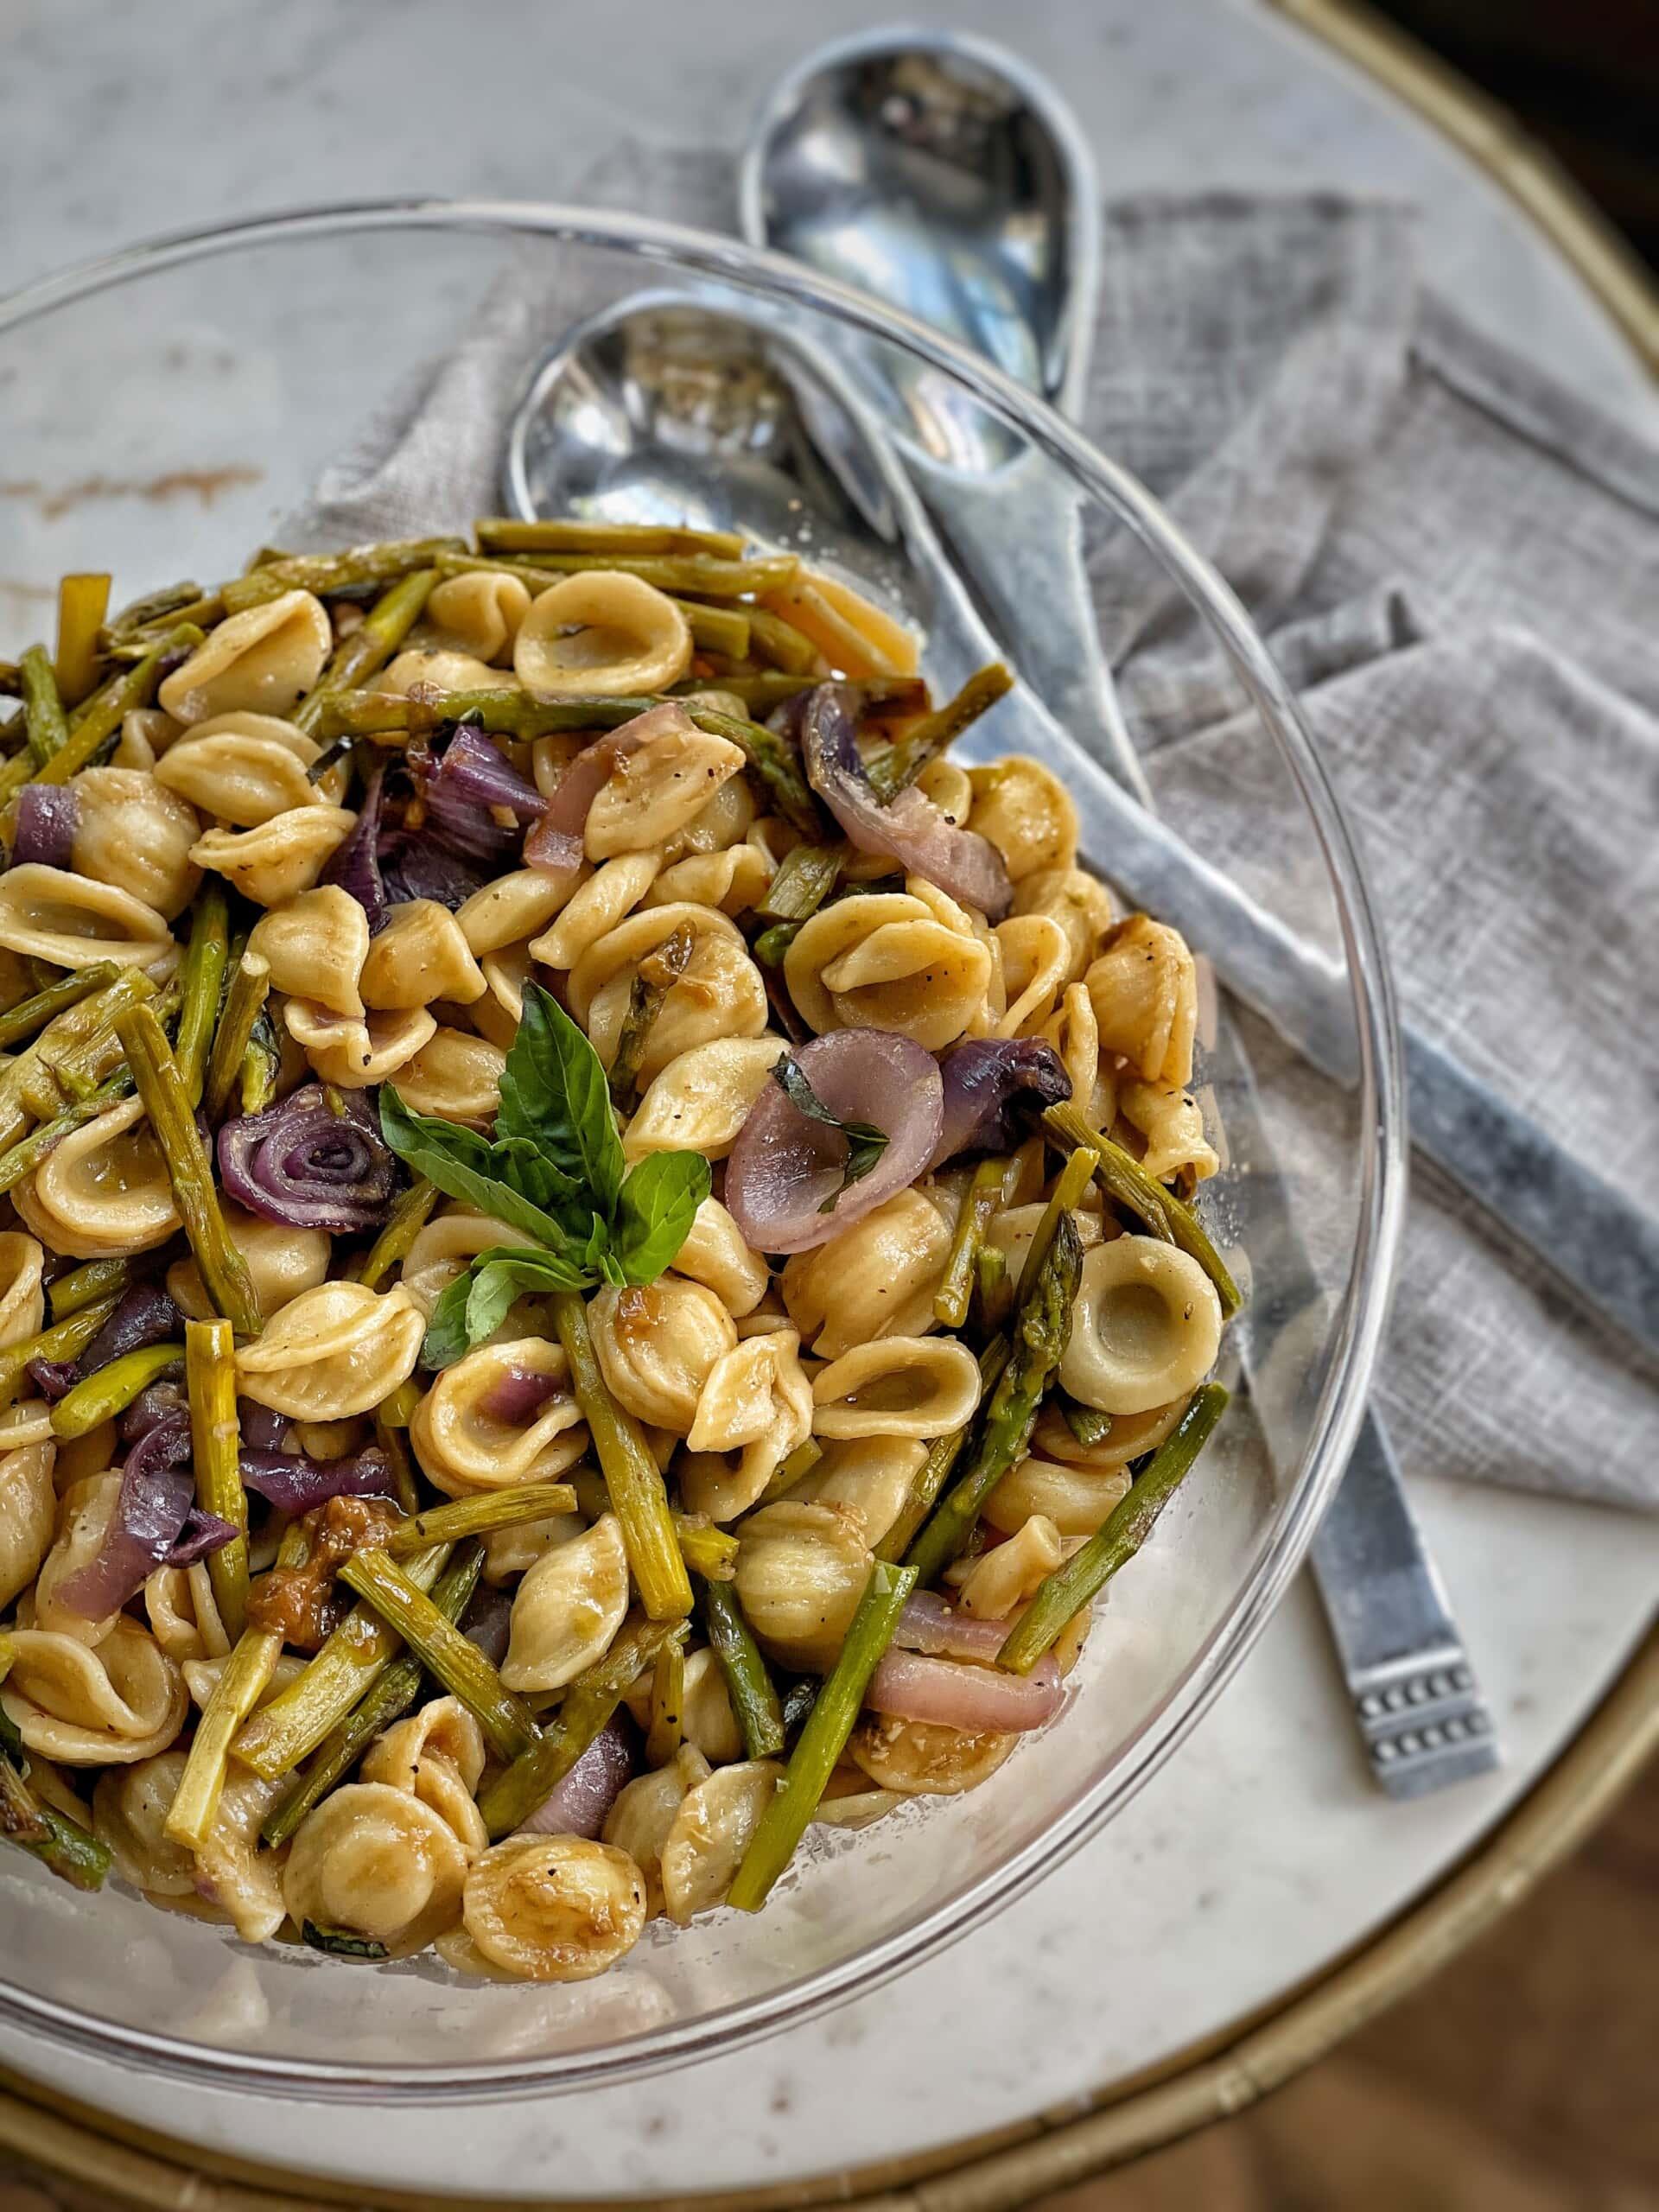 pasta salad with roasted garlic vinaigrette